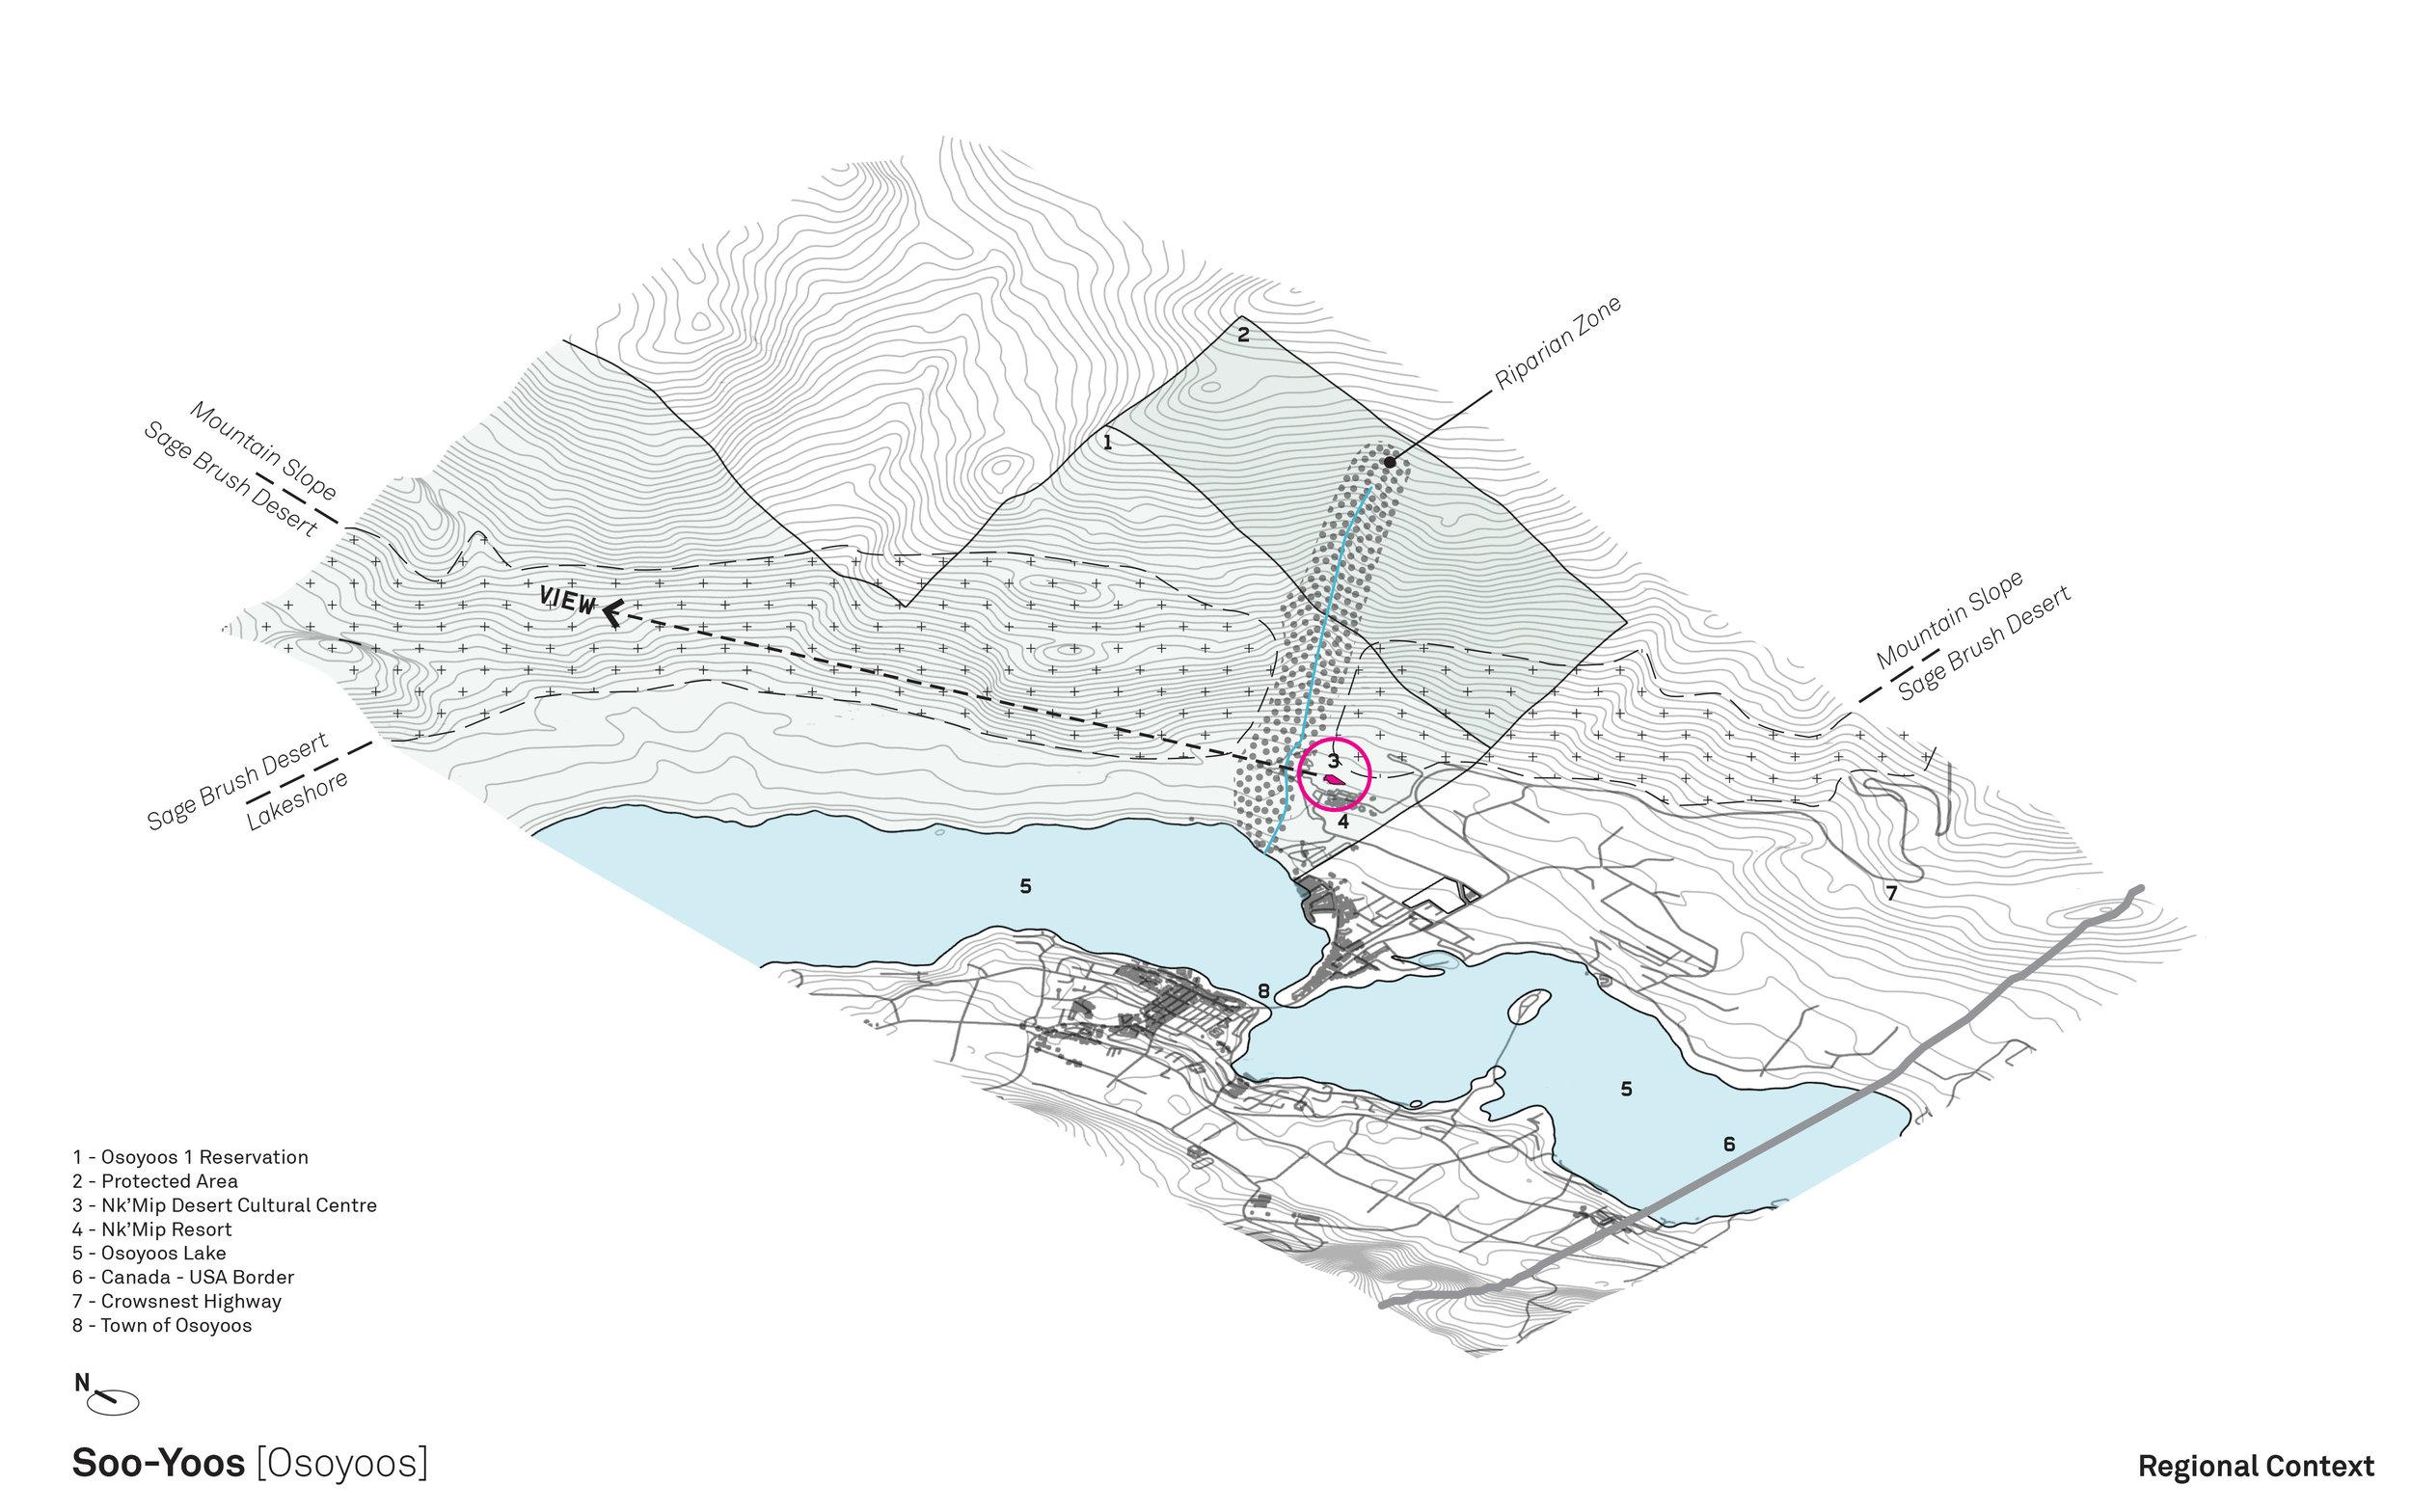 Nk'Mip Desert Cultural Centre Expansion-3.jpg